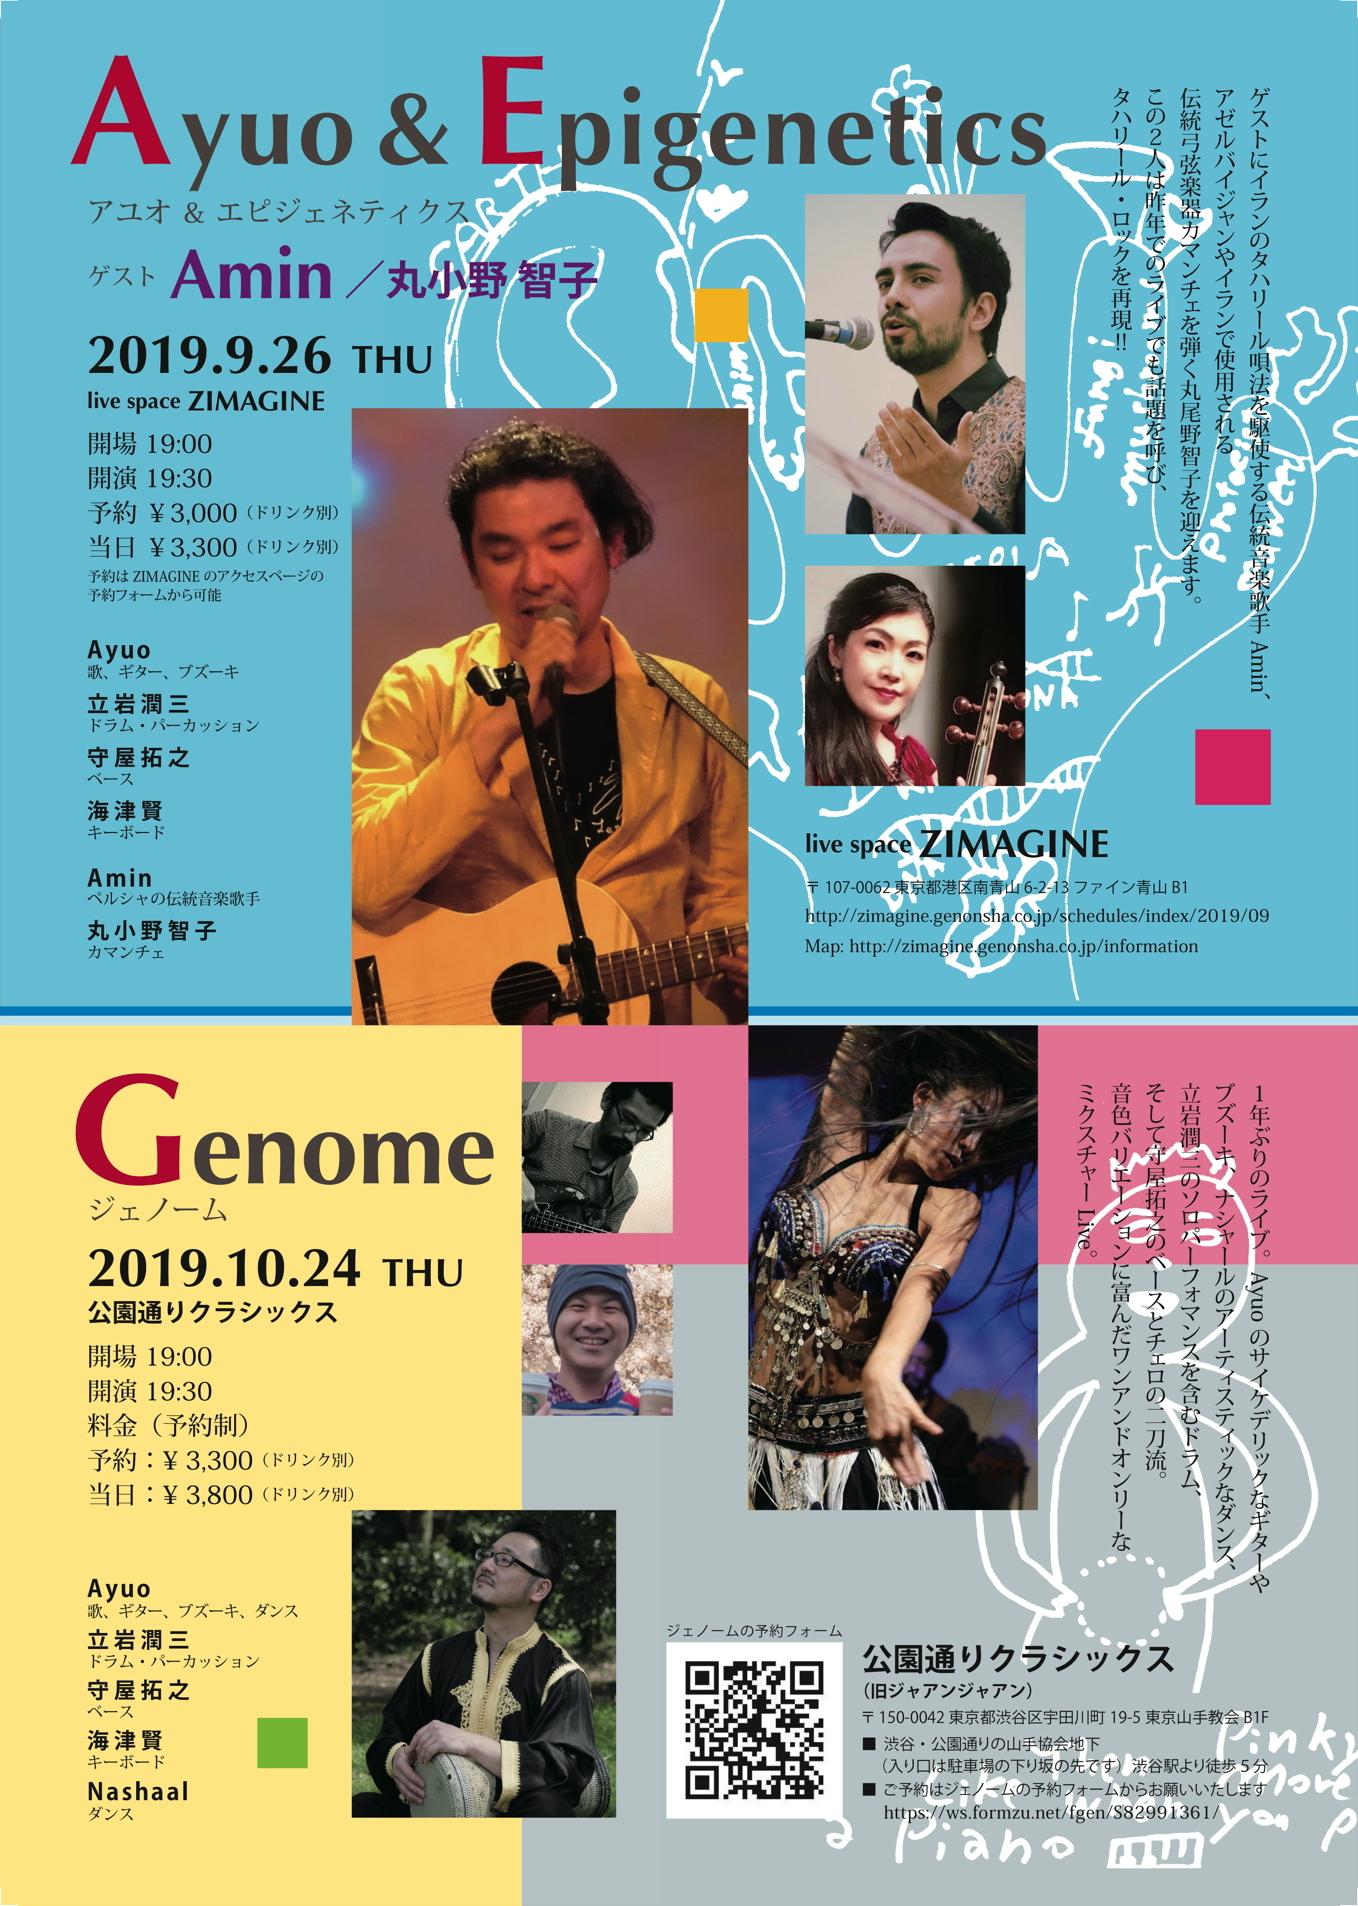 GENOME(ジェノーム)